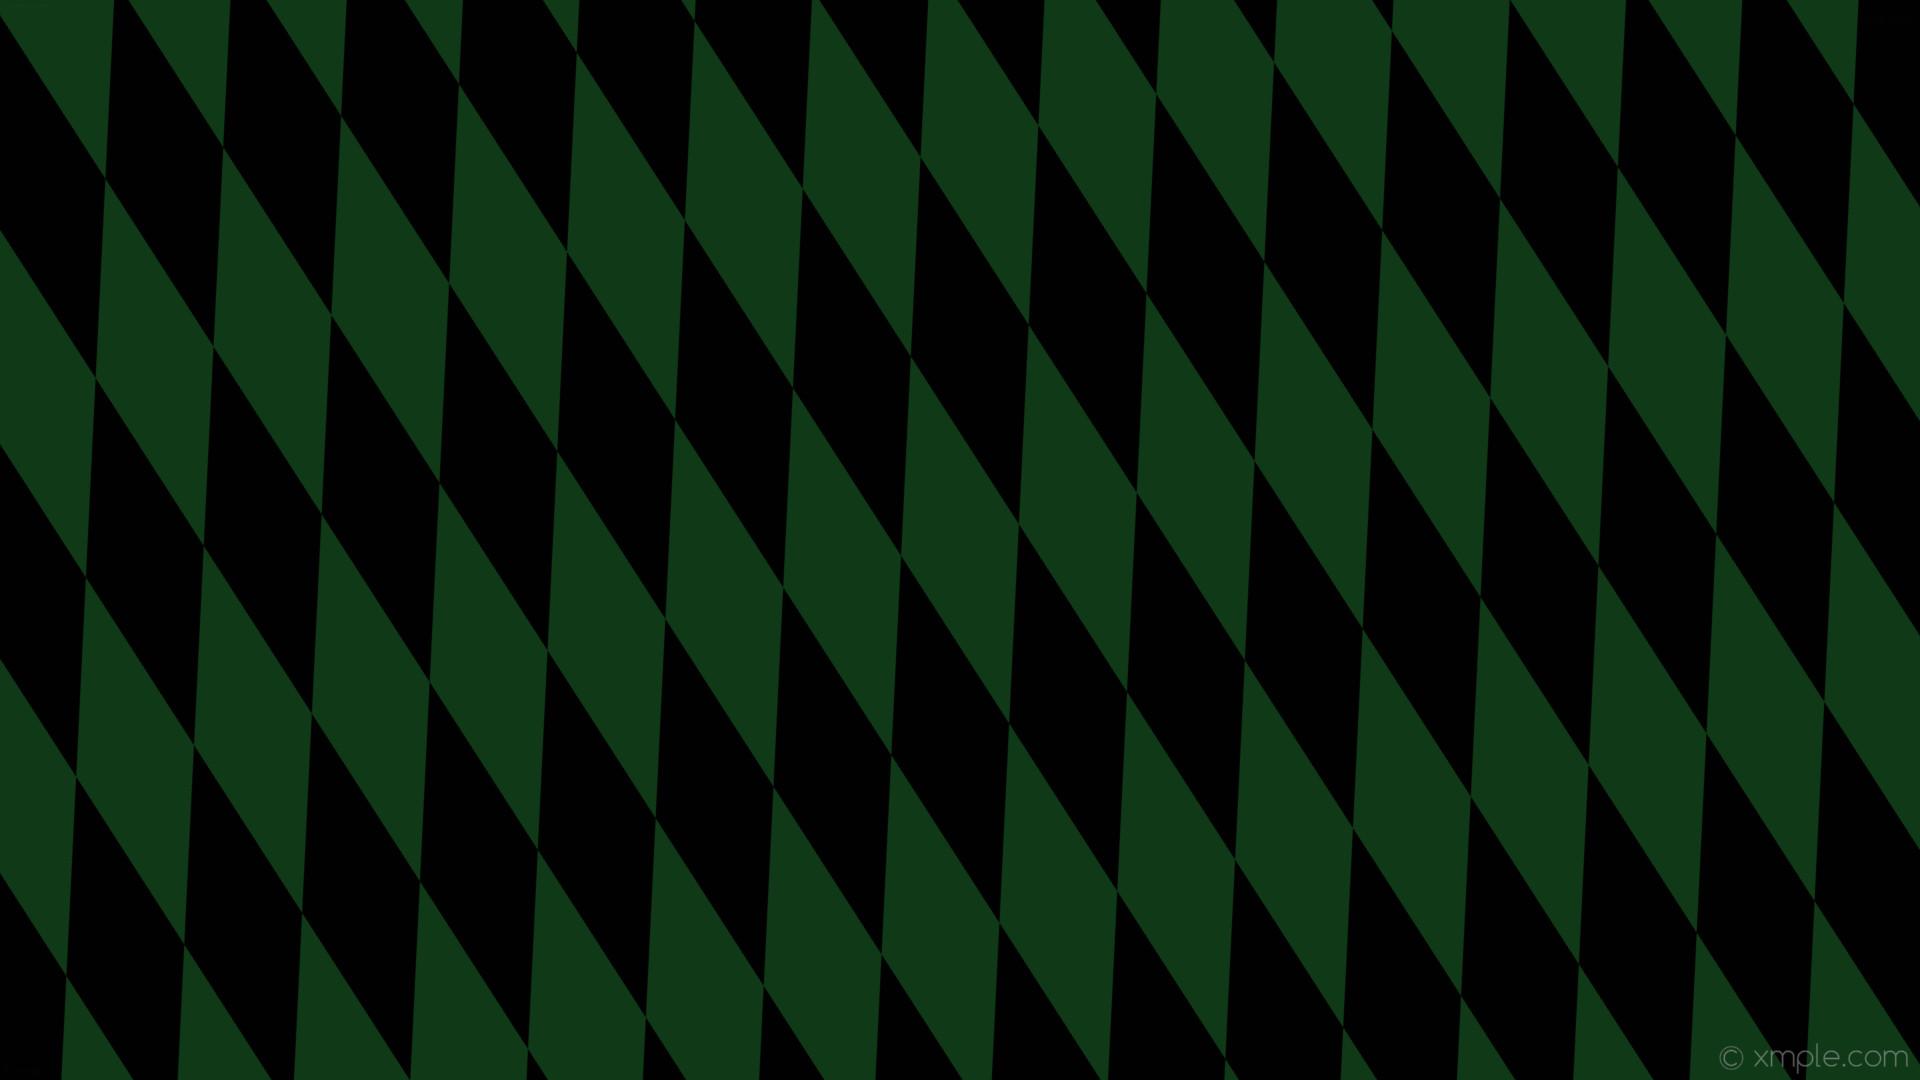 Res: 1920x1080, wallpaper green black diamond lozenge rhombus dark green #103917 #010101  105° 380px 122px